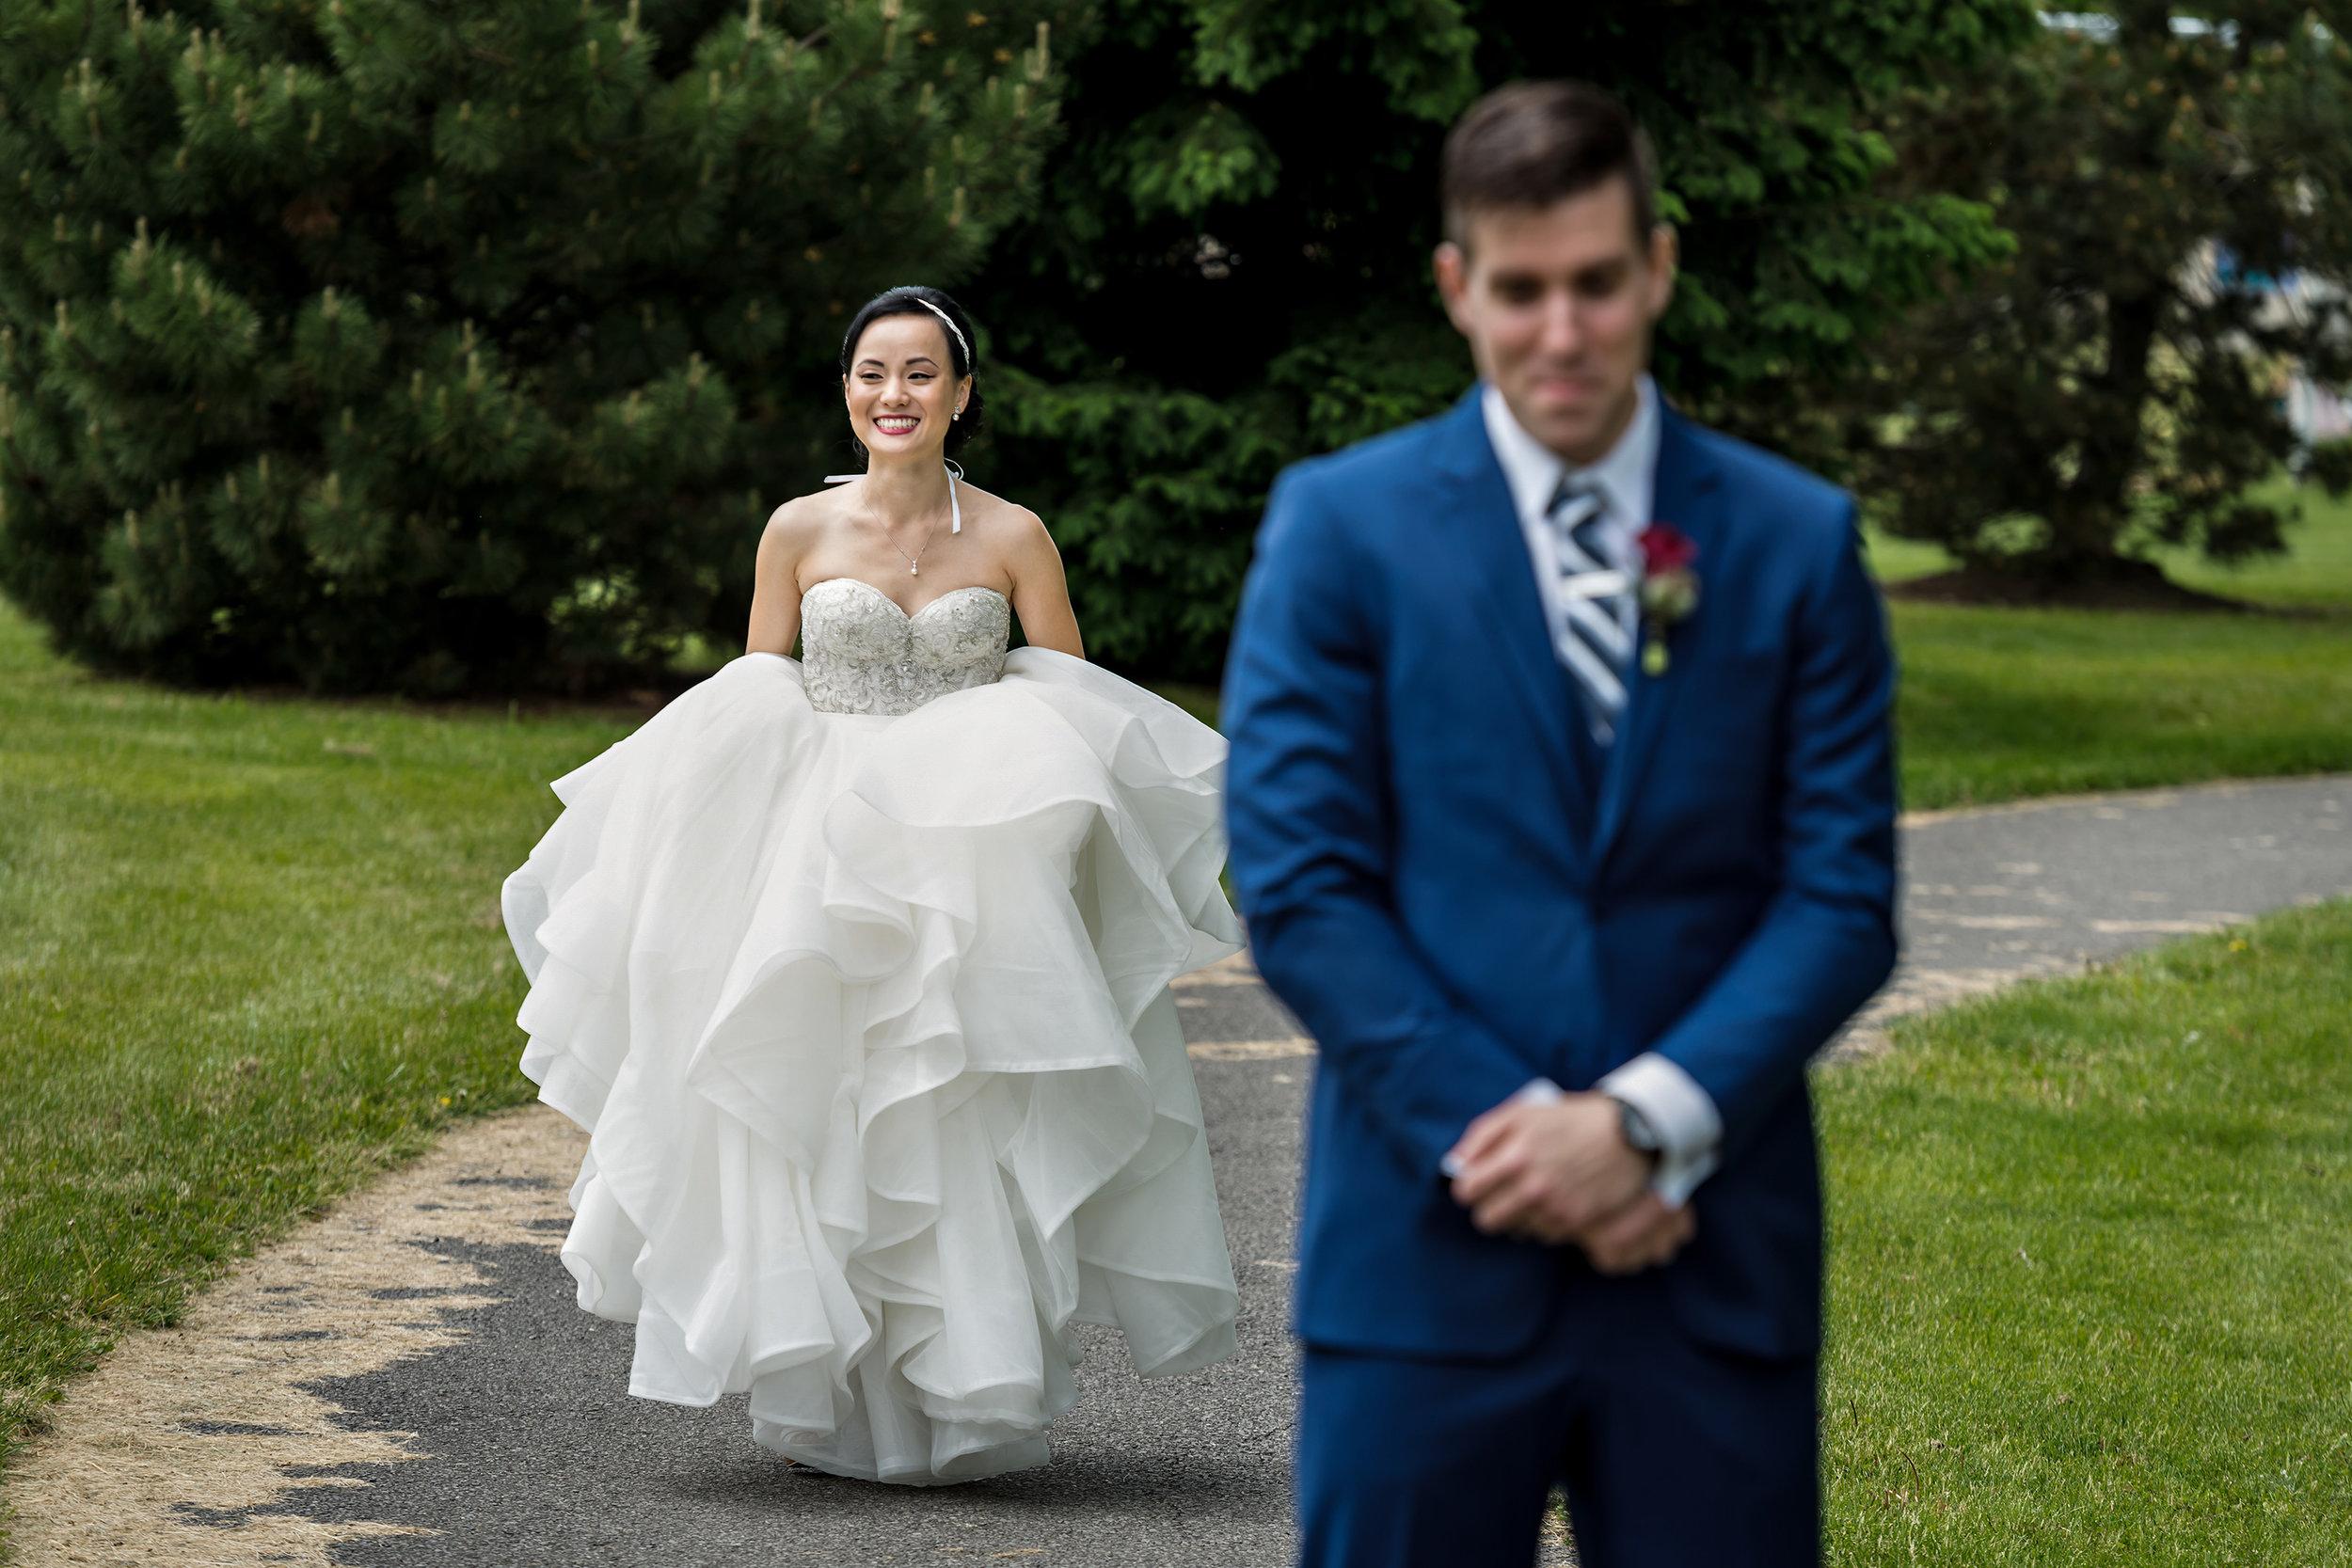 bride-and-groom-have-their-first-look-before-their-sidedoor-restaurant-wedding-in-ottawa-ontario.jpg